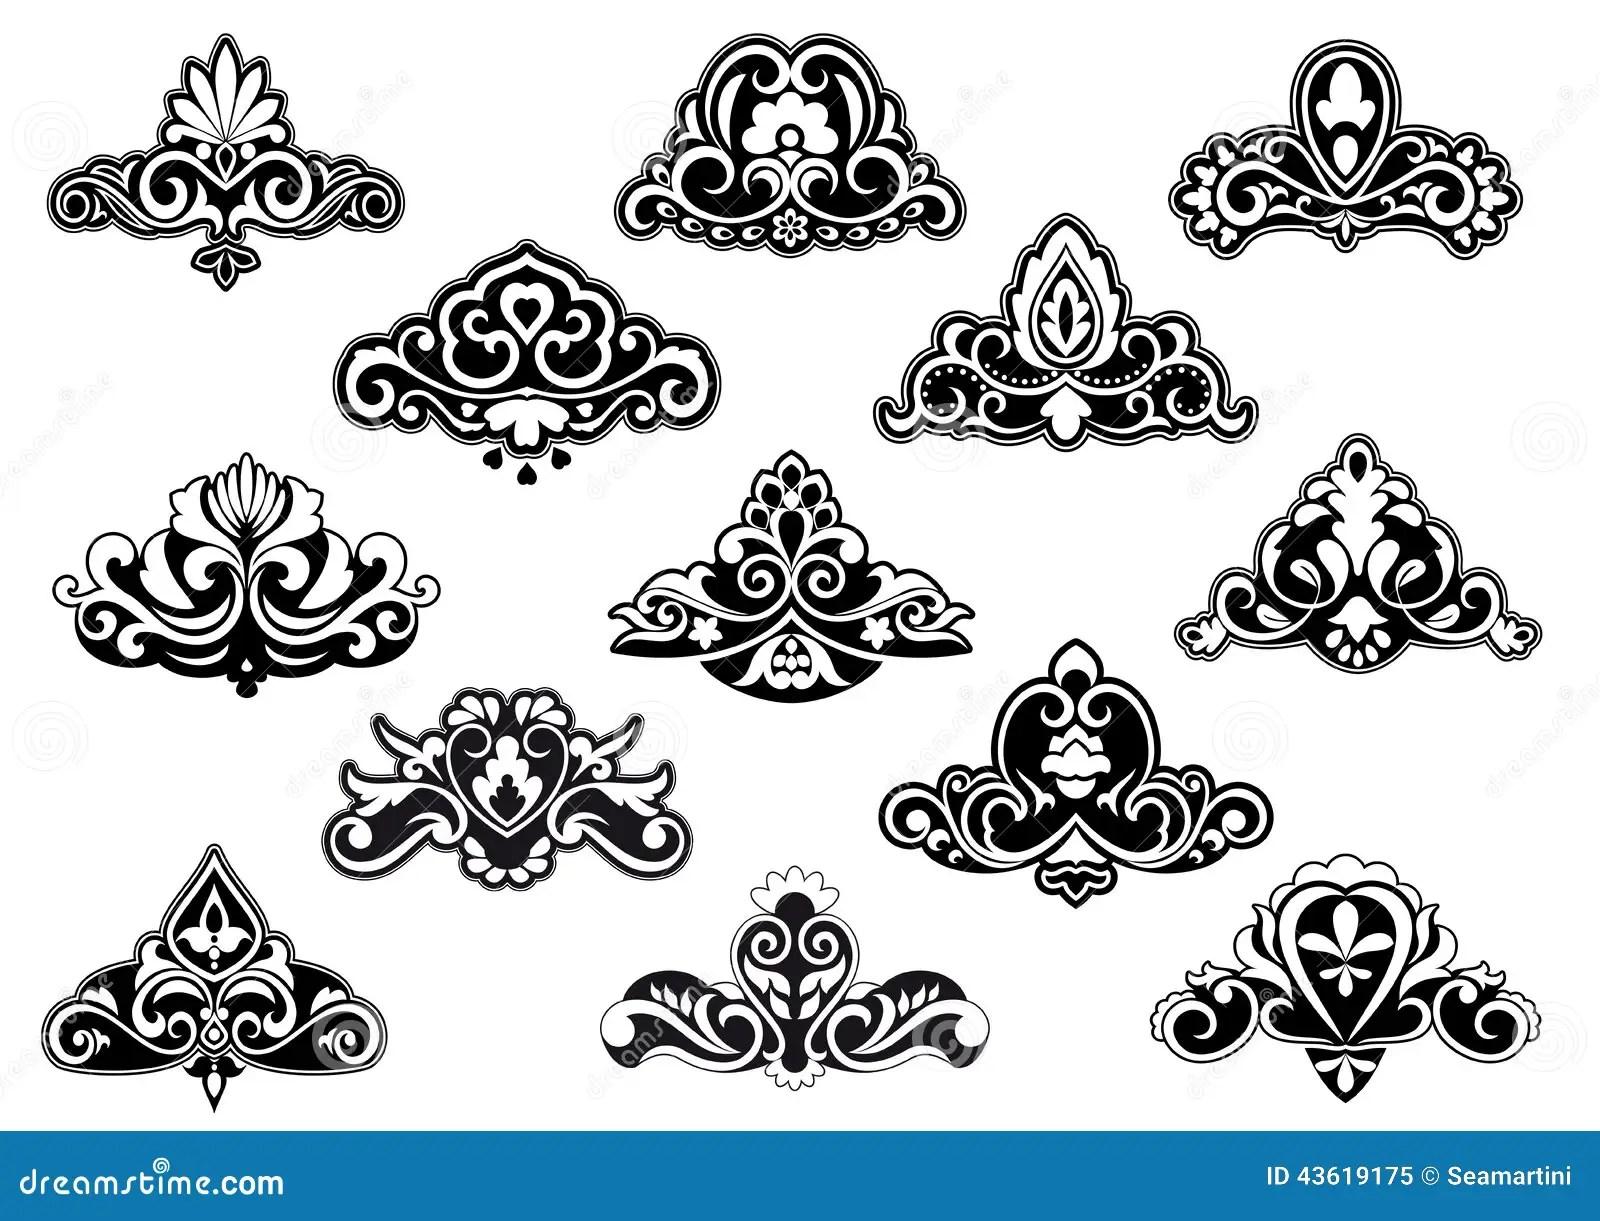 Decorative Floral Design Elements And Motifs Stock Vector